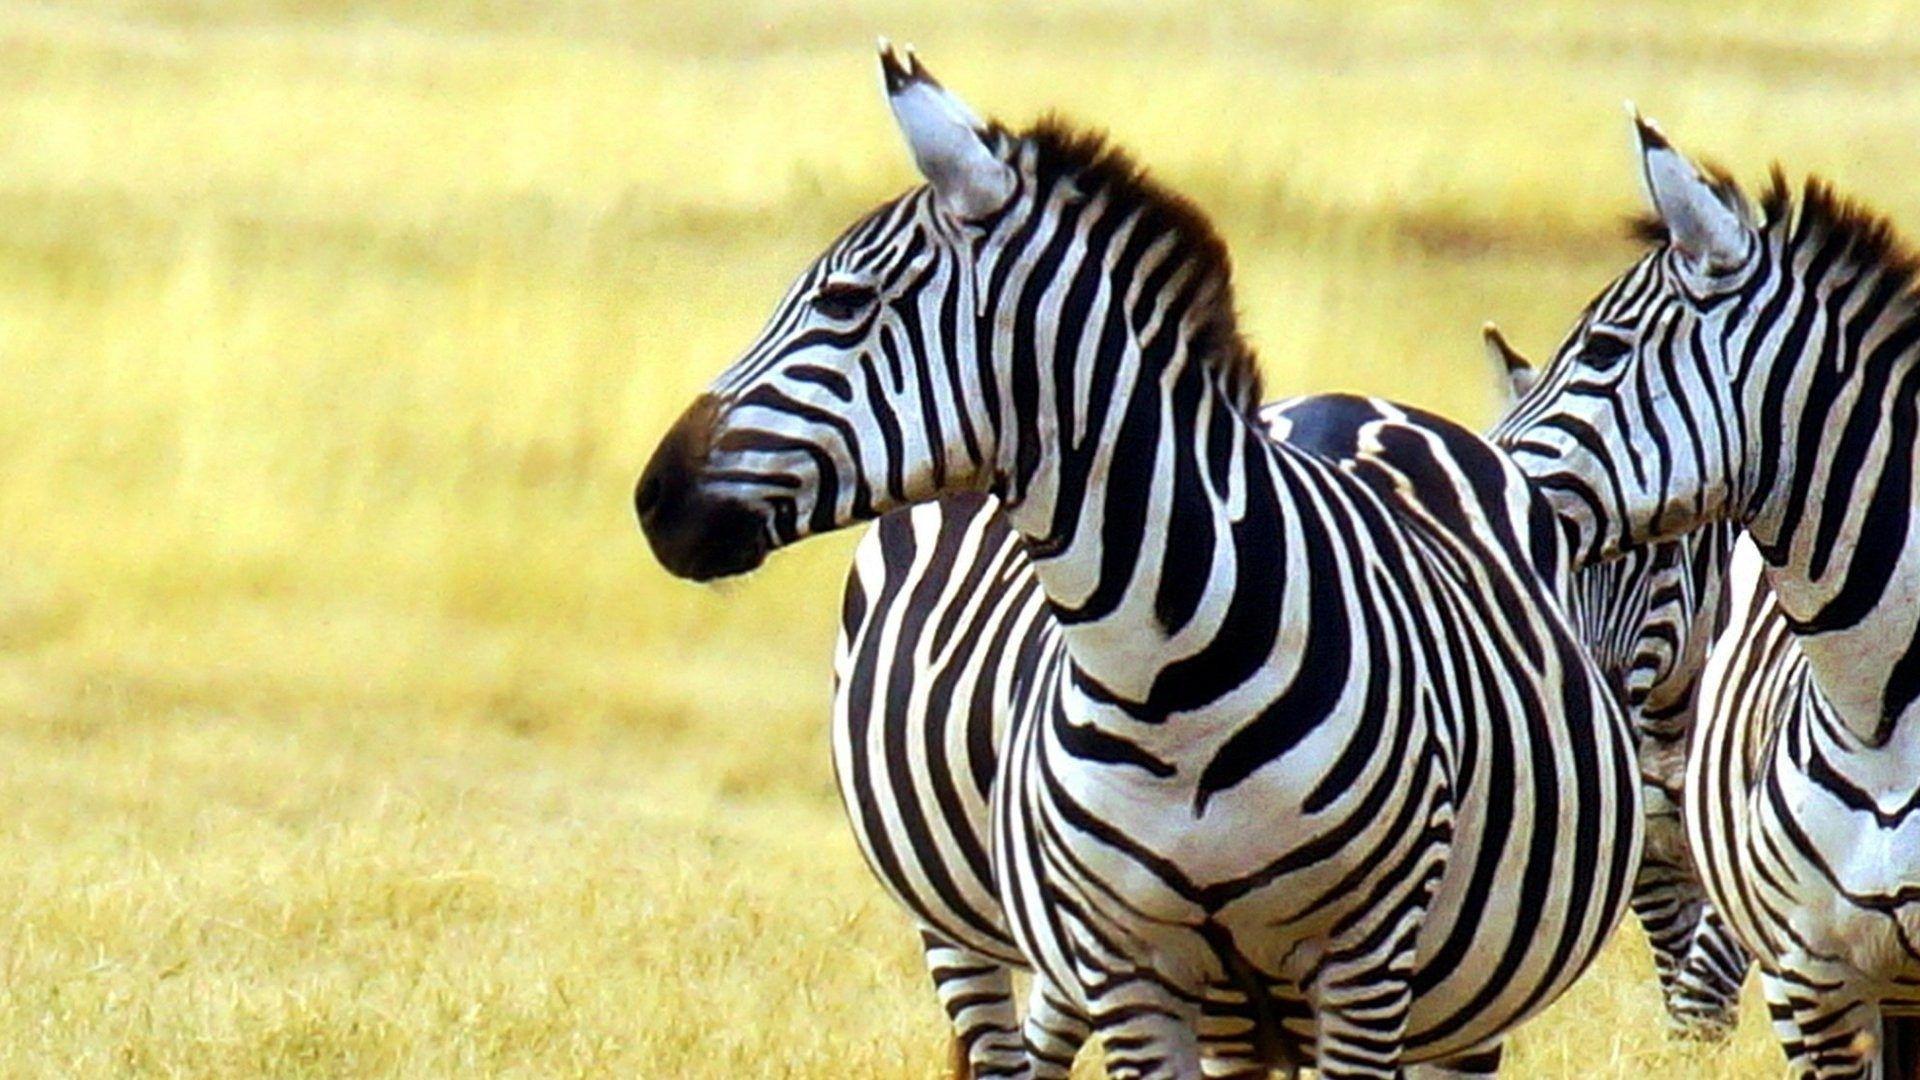 Beautiful Wallpapers Zebra